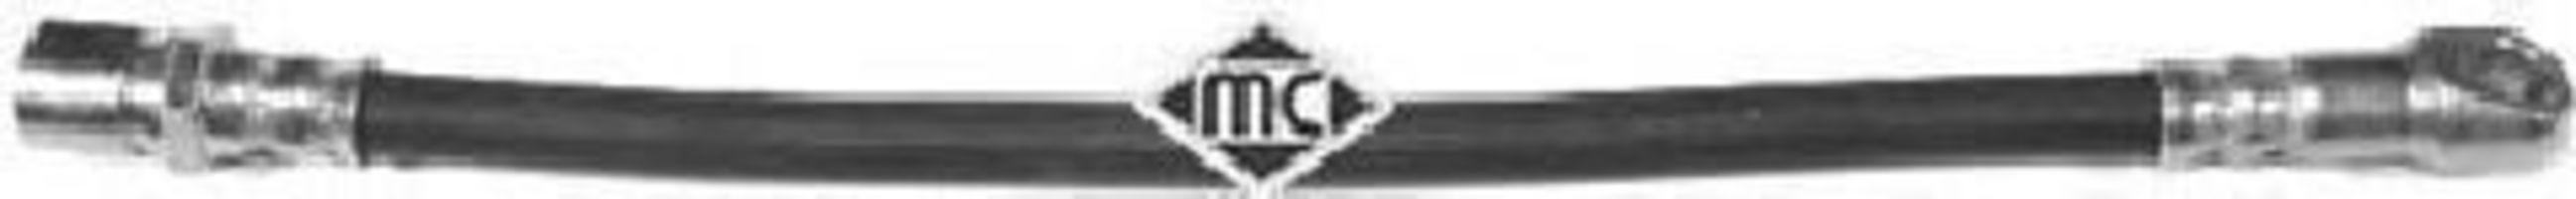 Шланг тормозной METALCAUCHO 96083